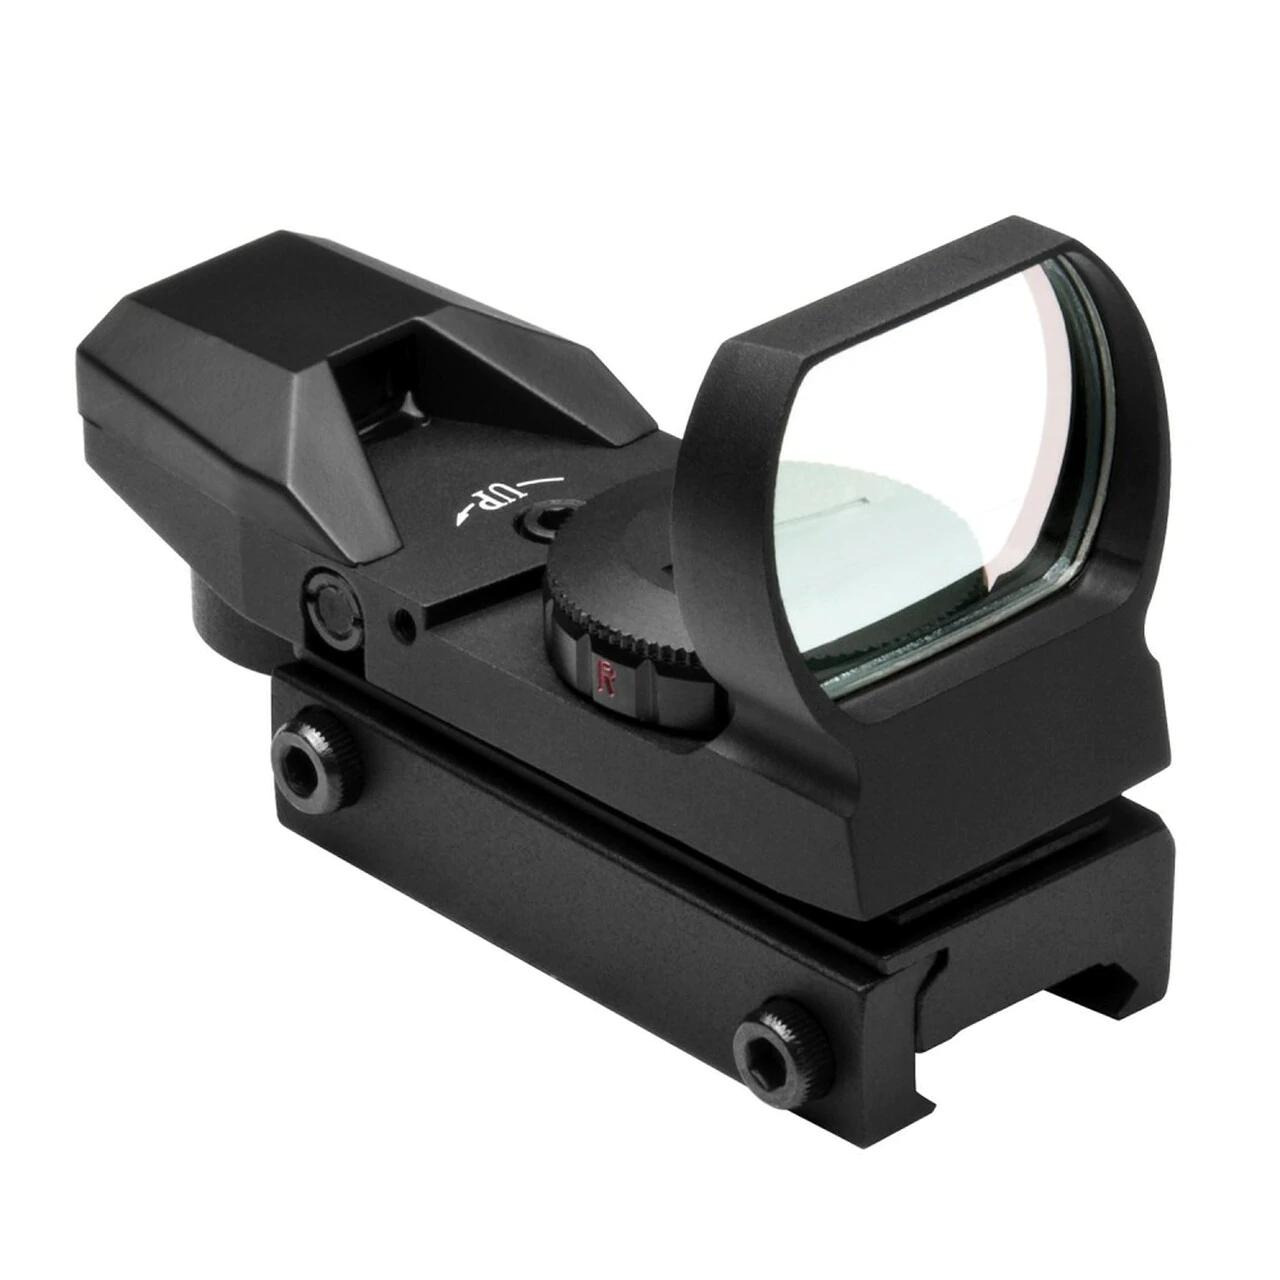 Airsoft Red Dot Sights